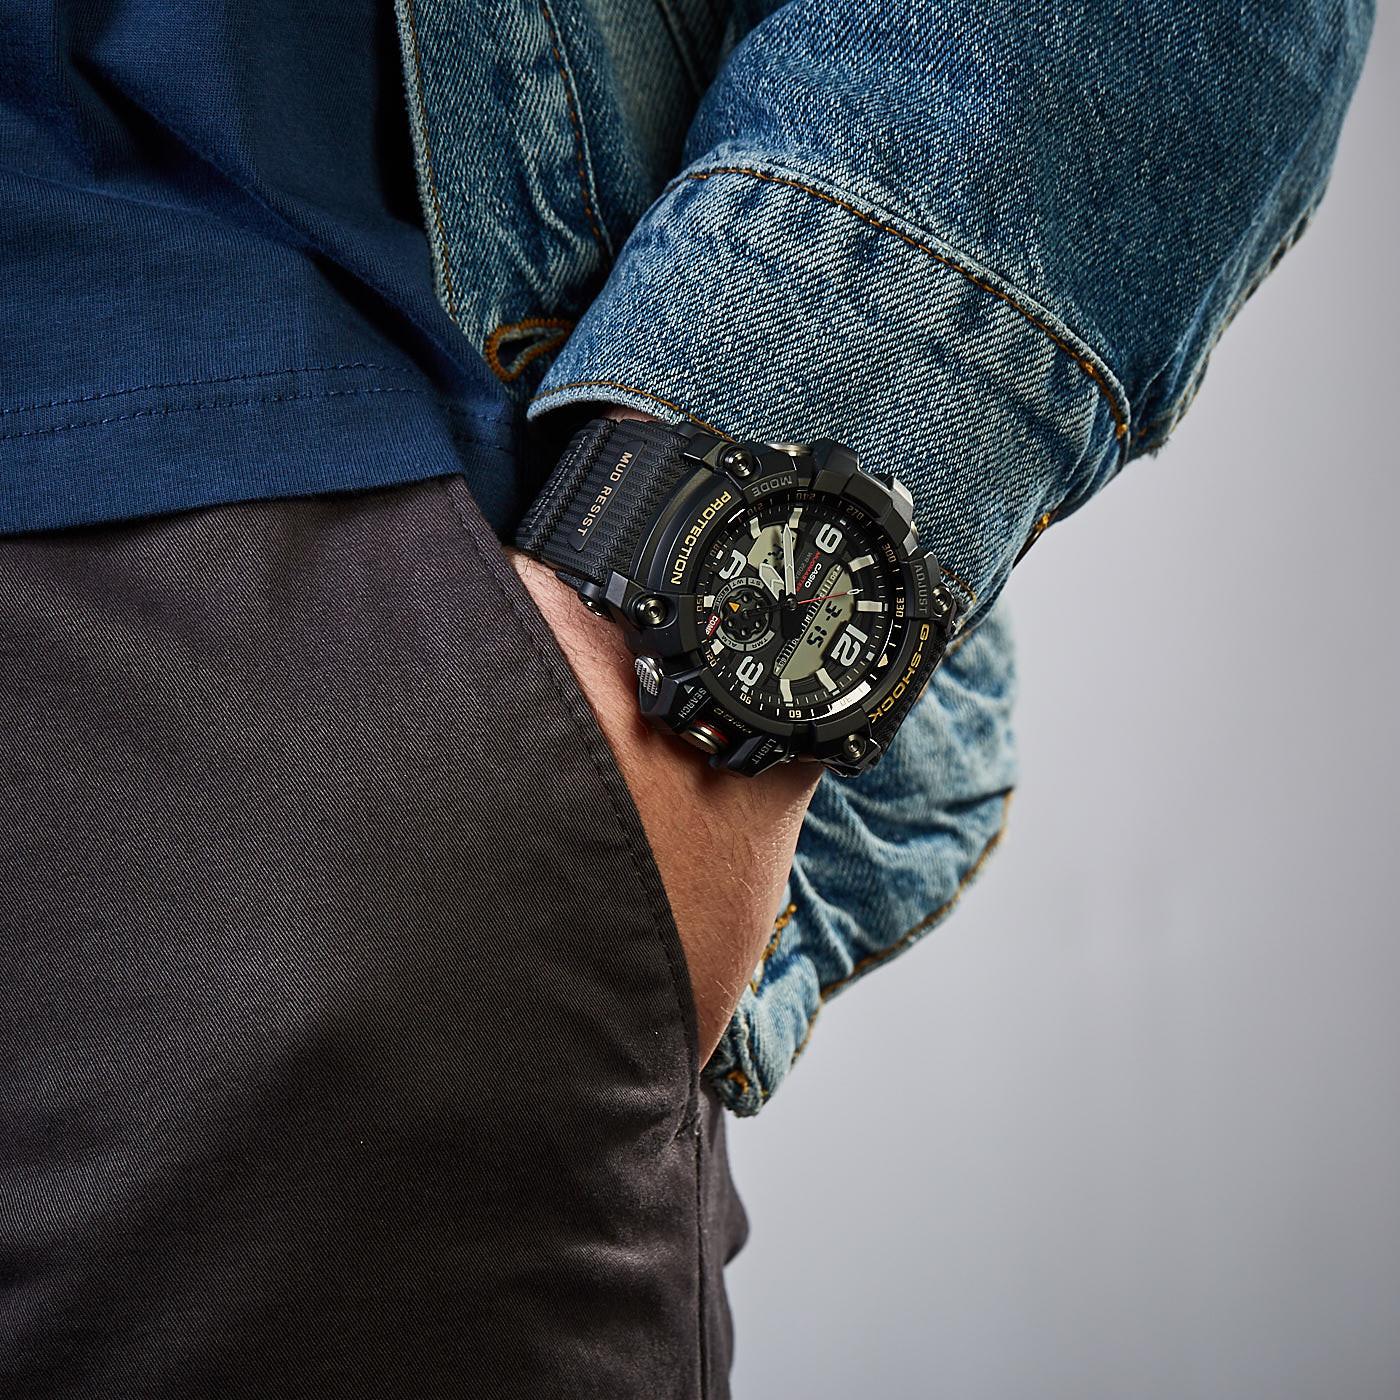 Casio G-Shock Mudmaster Twin Sensor horloge GG-1000-1AER